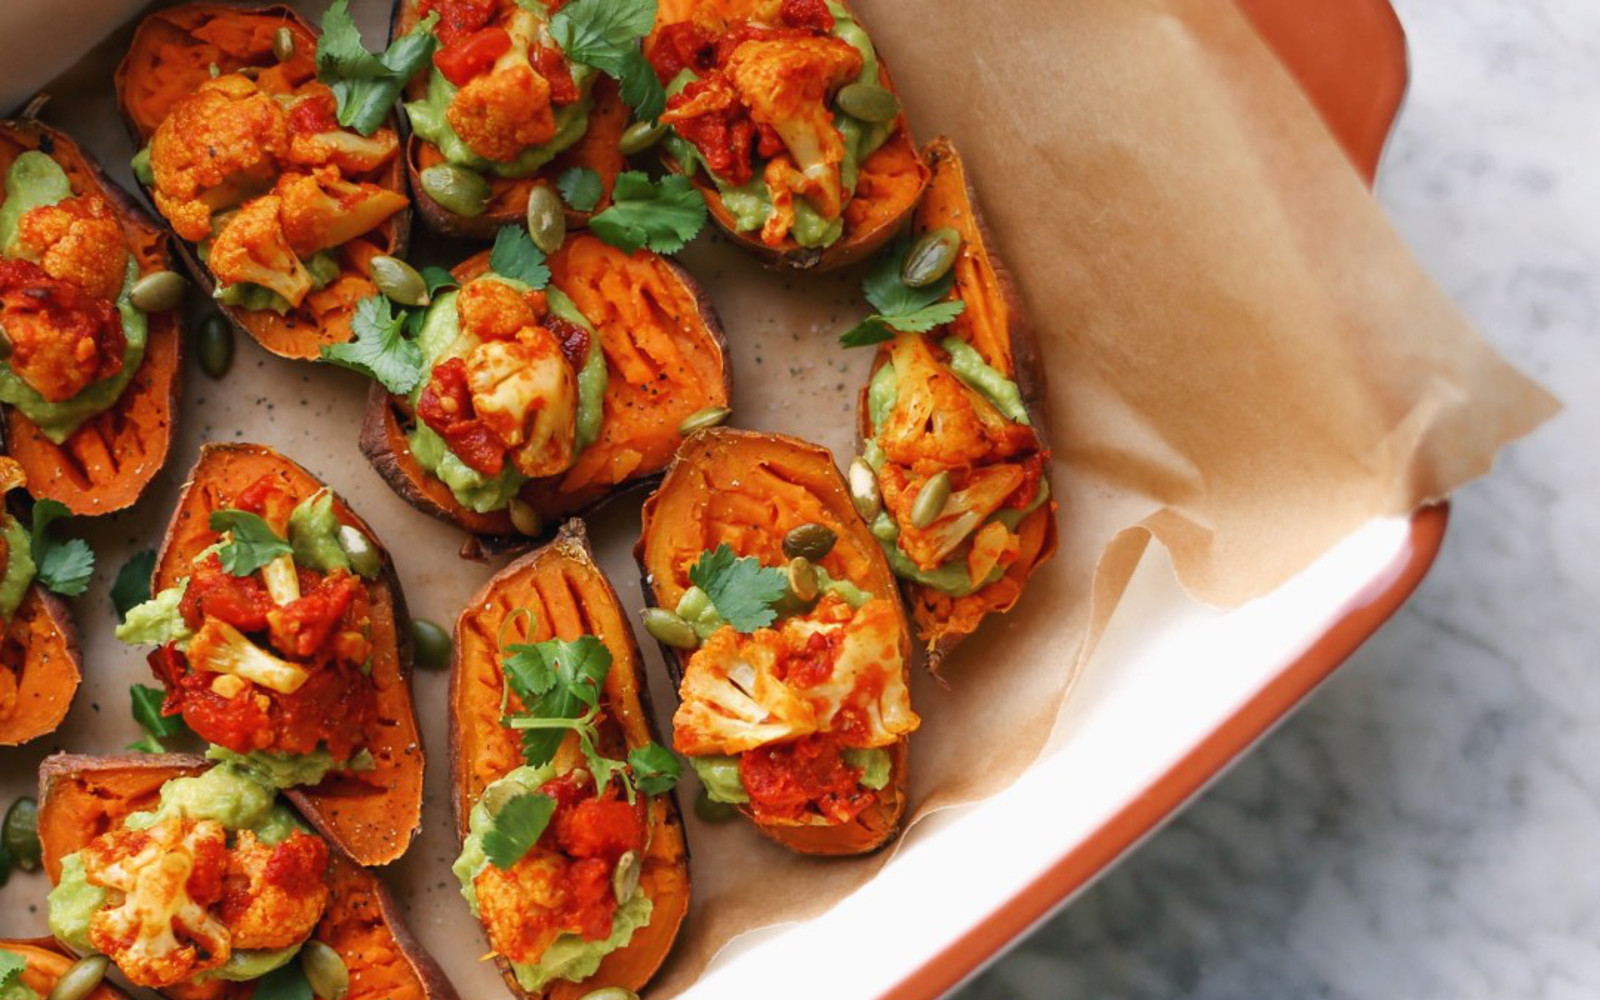 Sweet Potato Bites With Guacamole and Cauliflower,